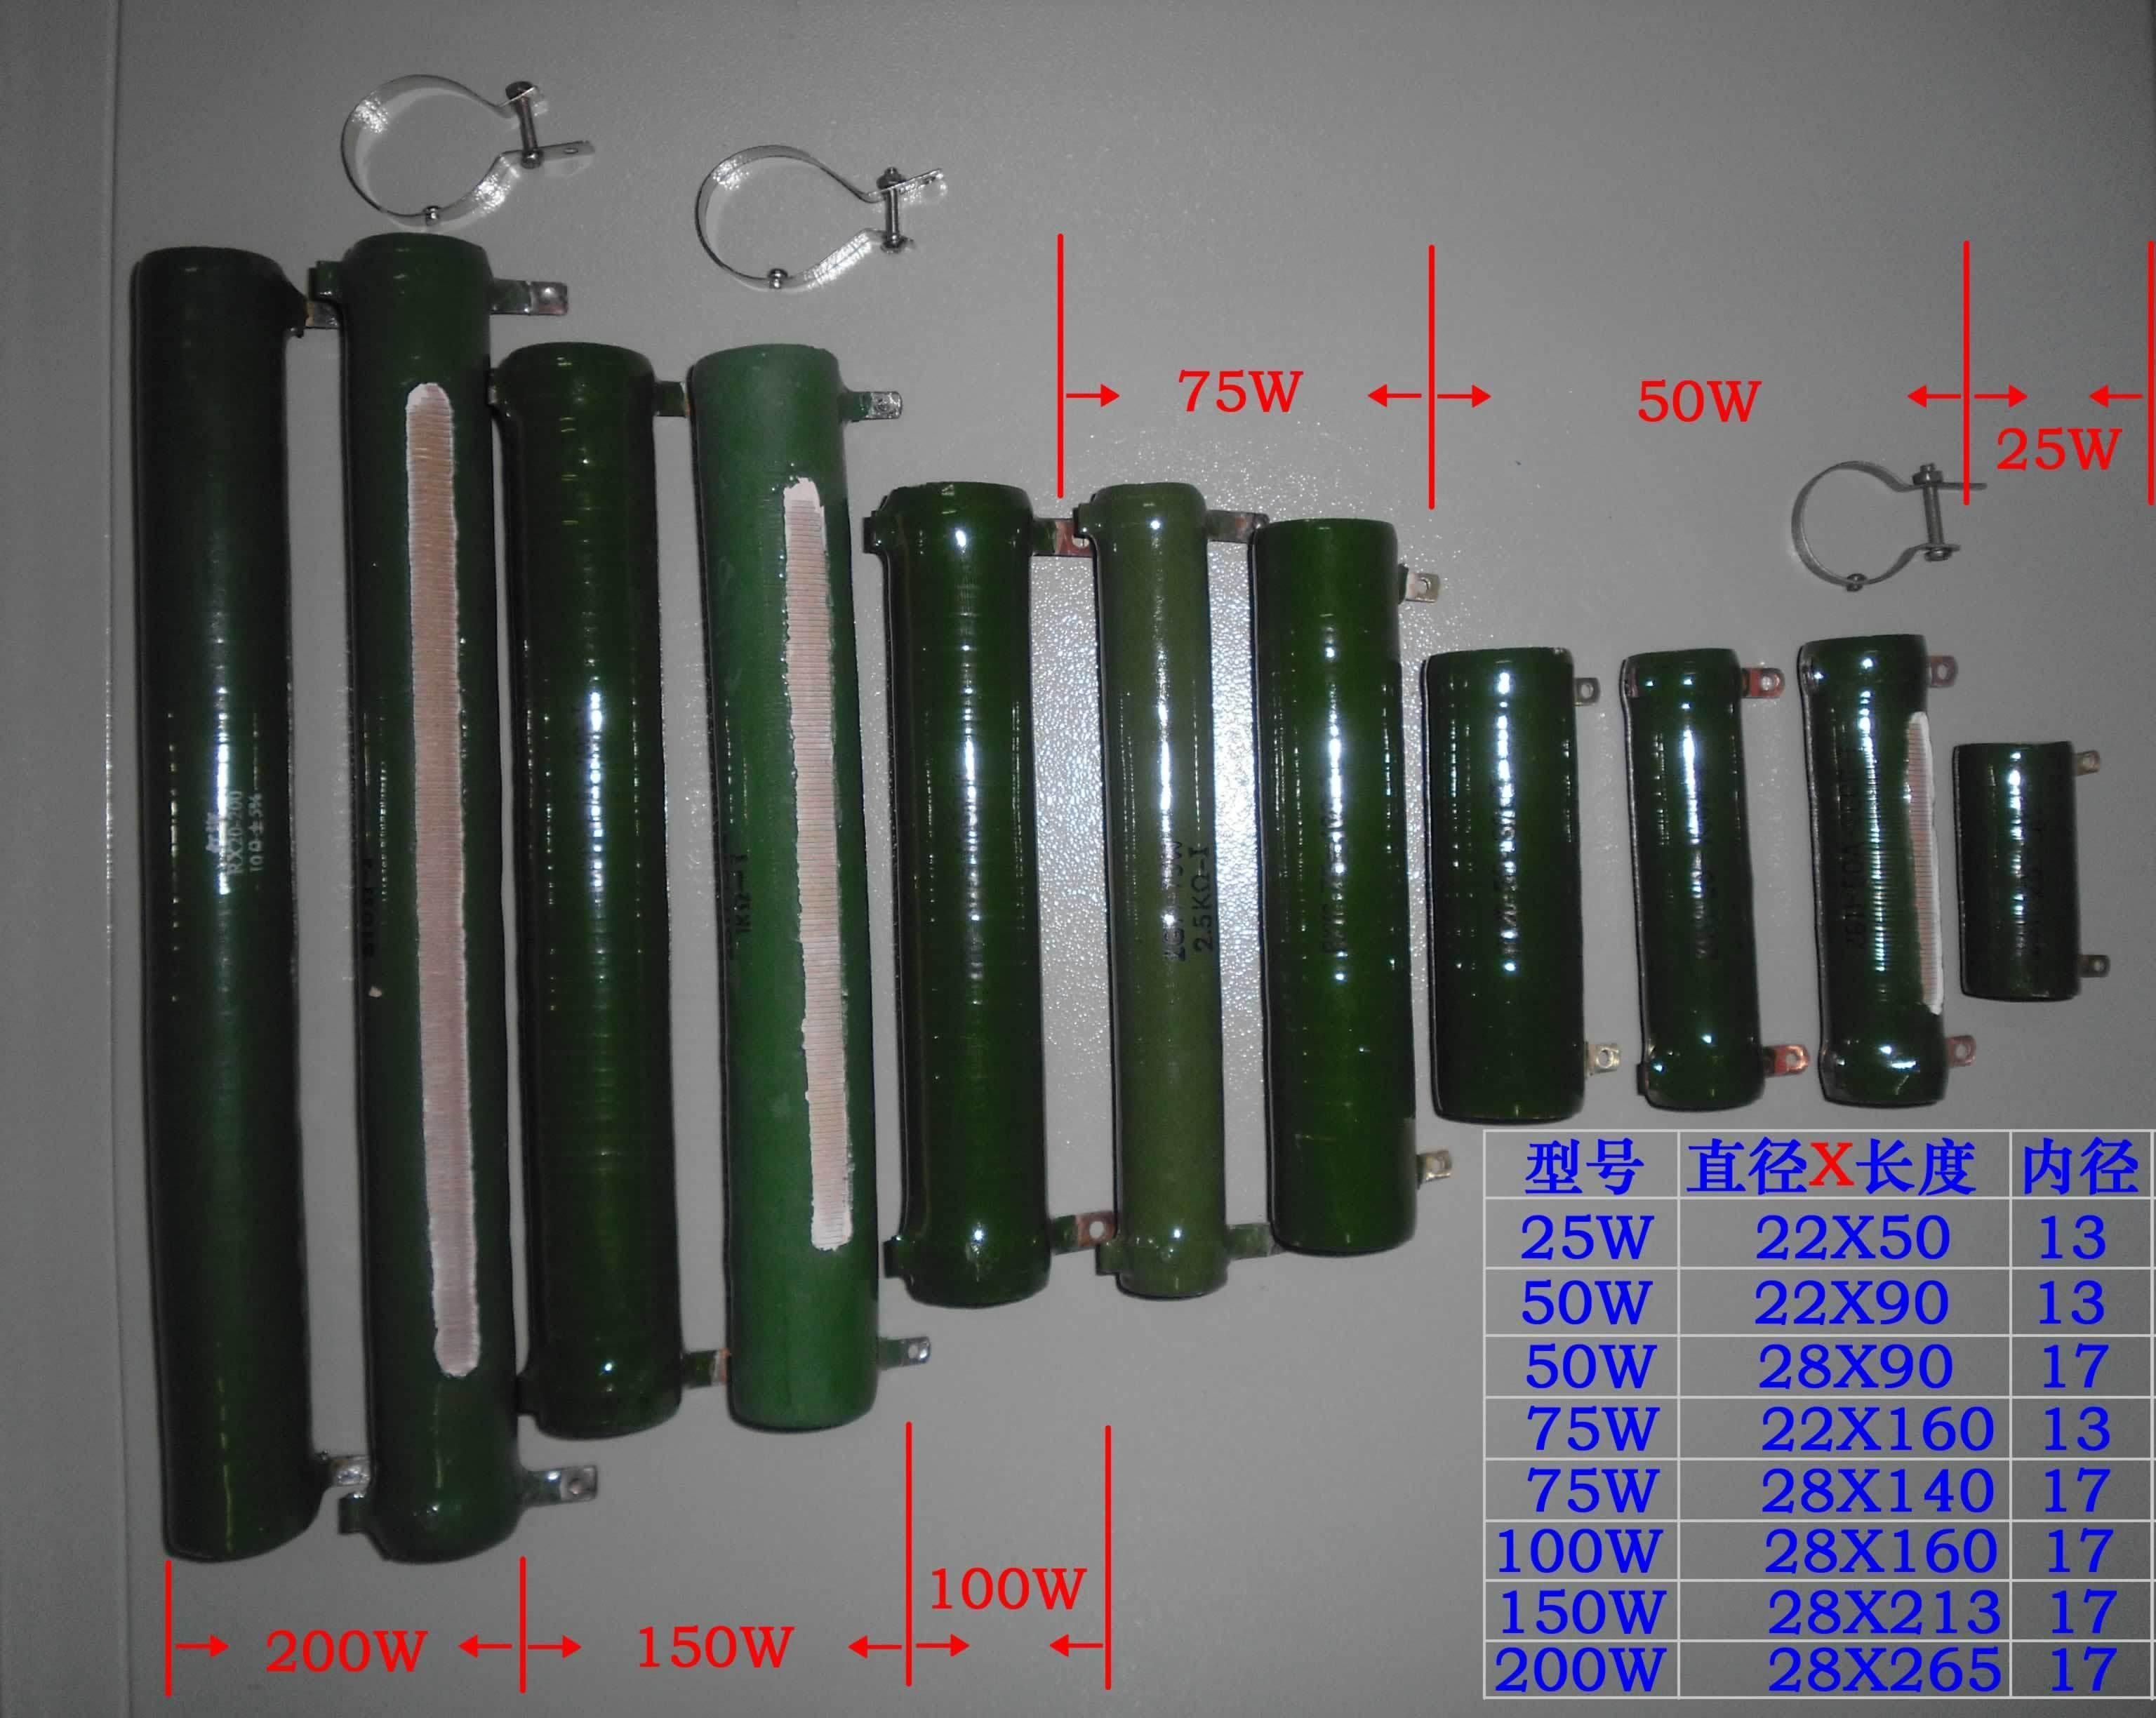 Розетка Керамические типа rxyc для алмазной репутацию ㊣ rx20 zg11-50W 51 ω